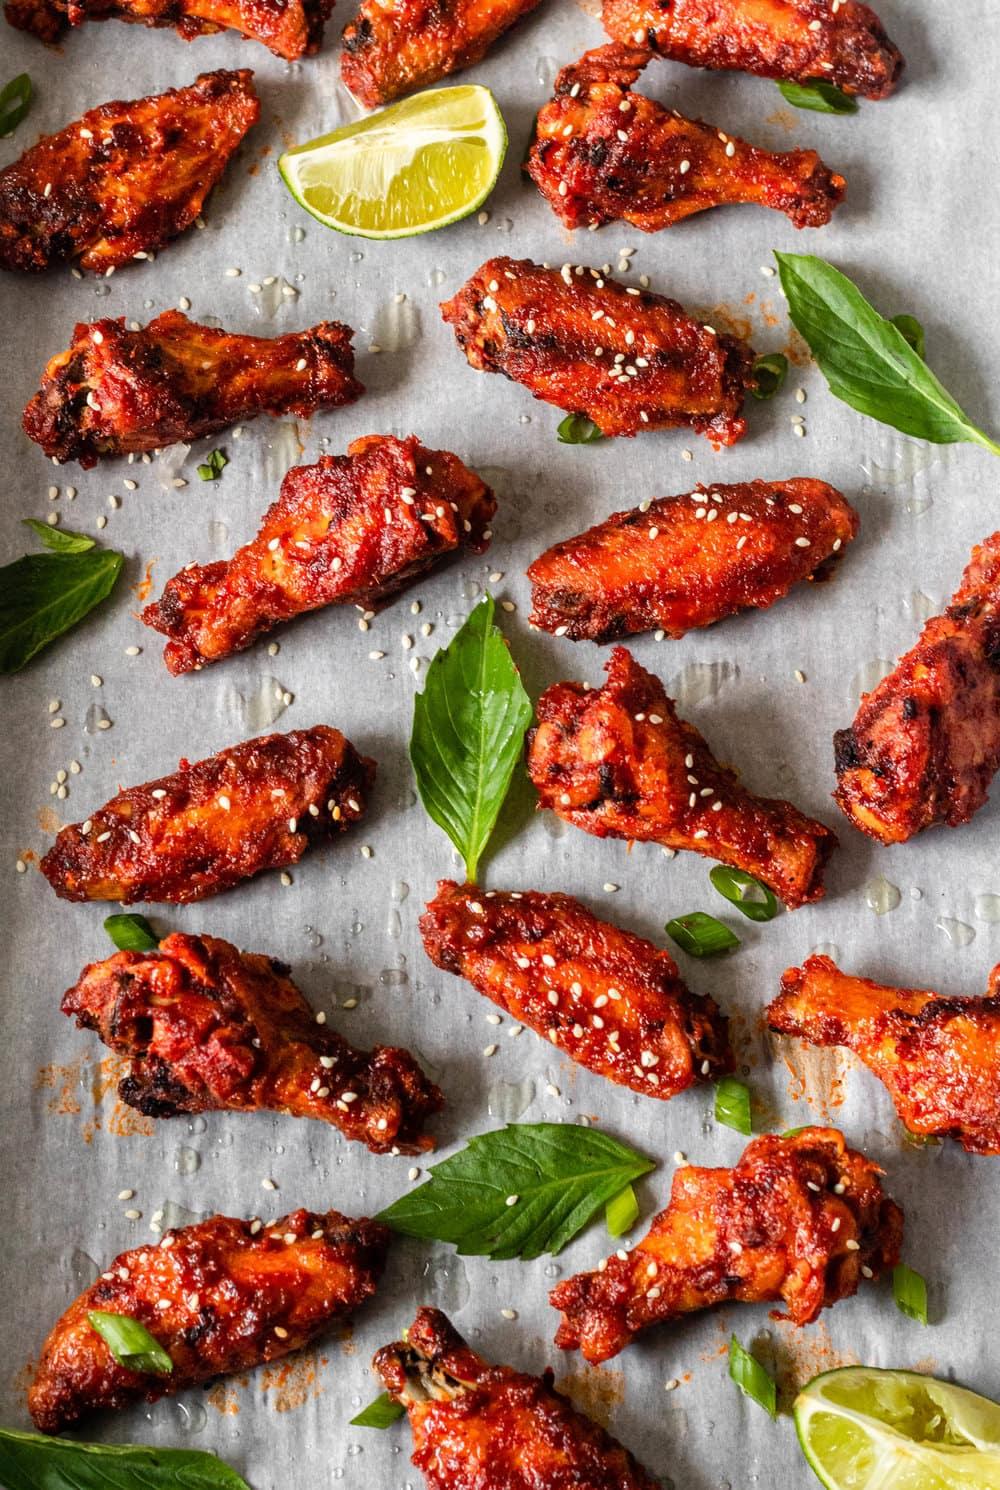 Thai Red Curry Chicken Wings - sheet pan.jpg